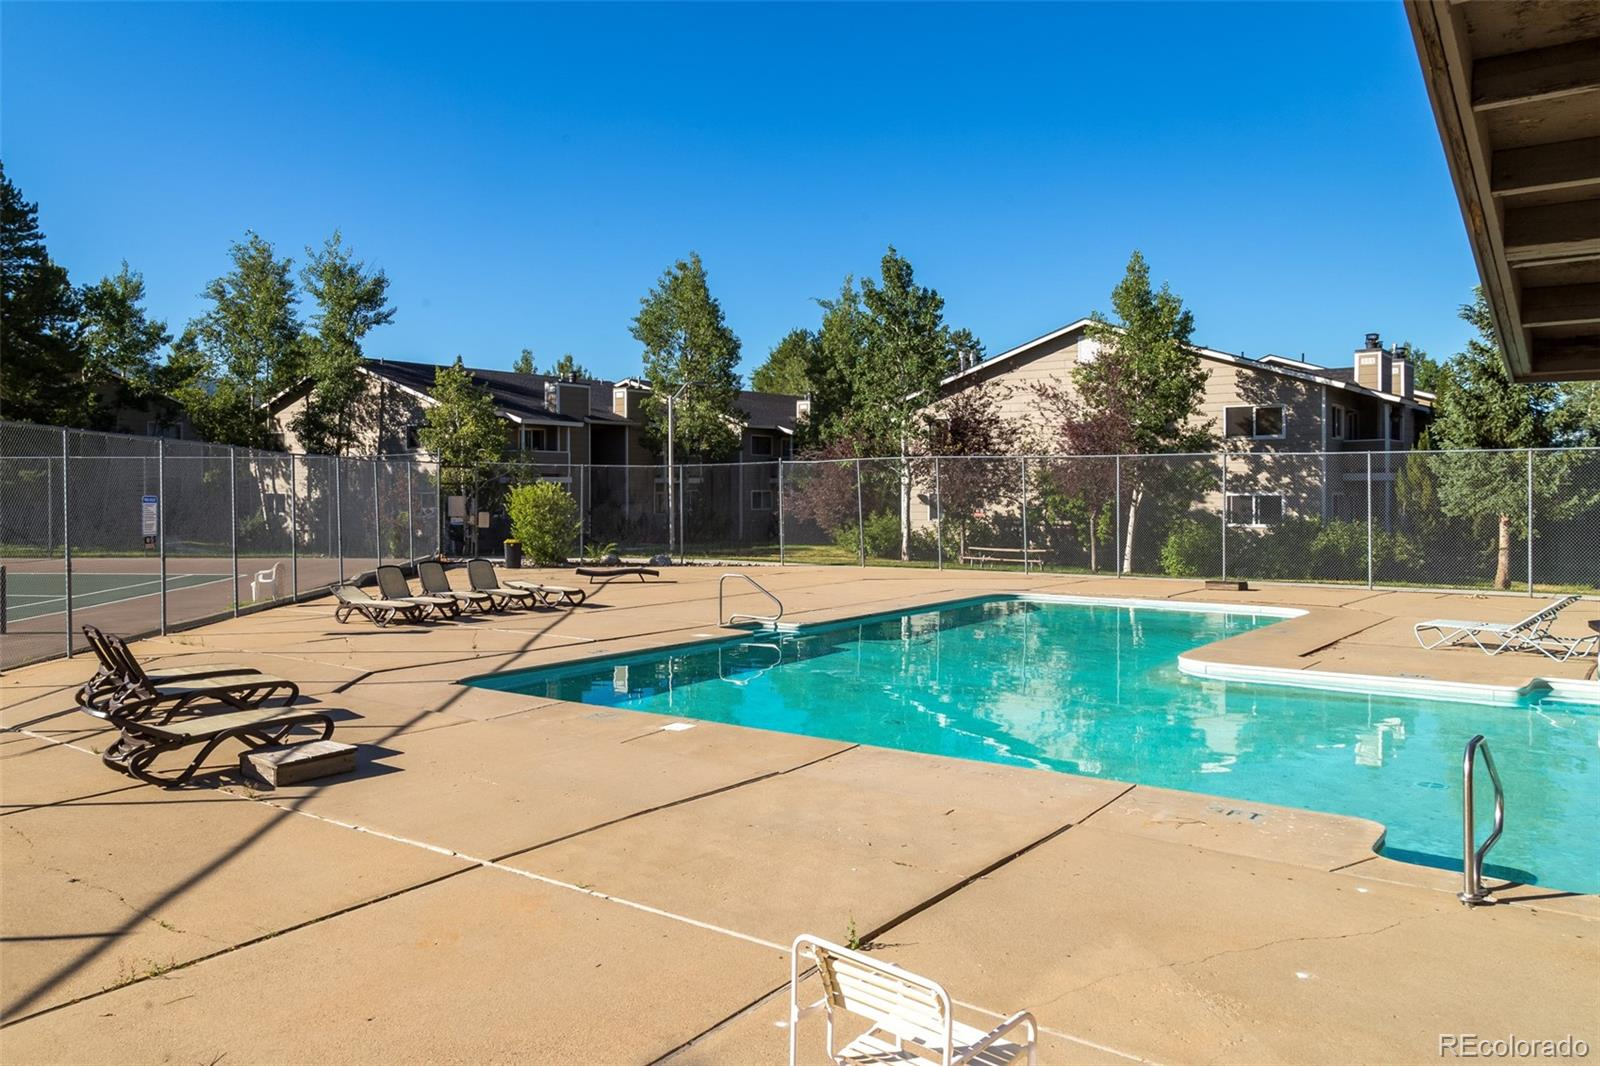 MLS# 5816259 - 15 - 1385 Sparta Plaza #7, Steamboat Springs, CO 80487